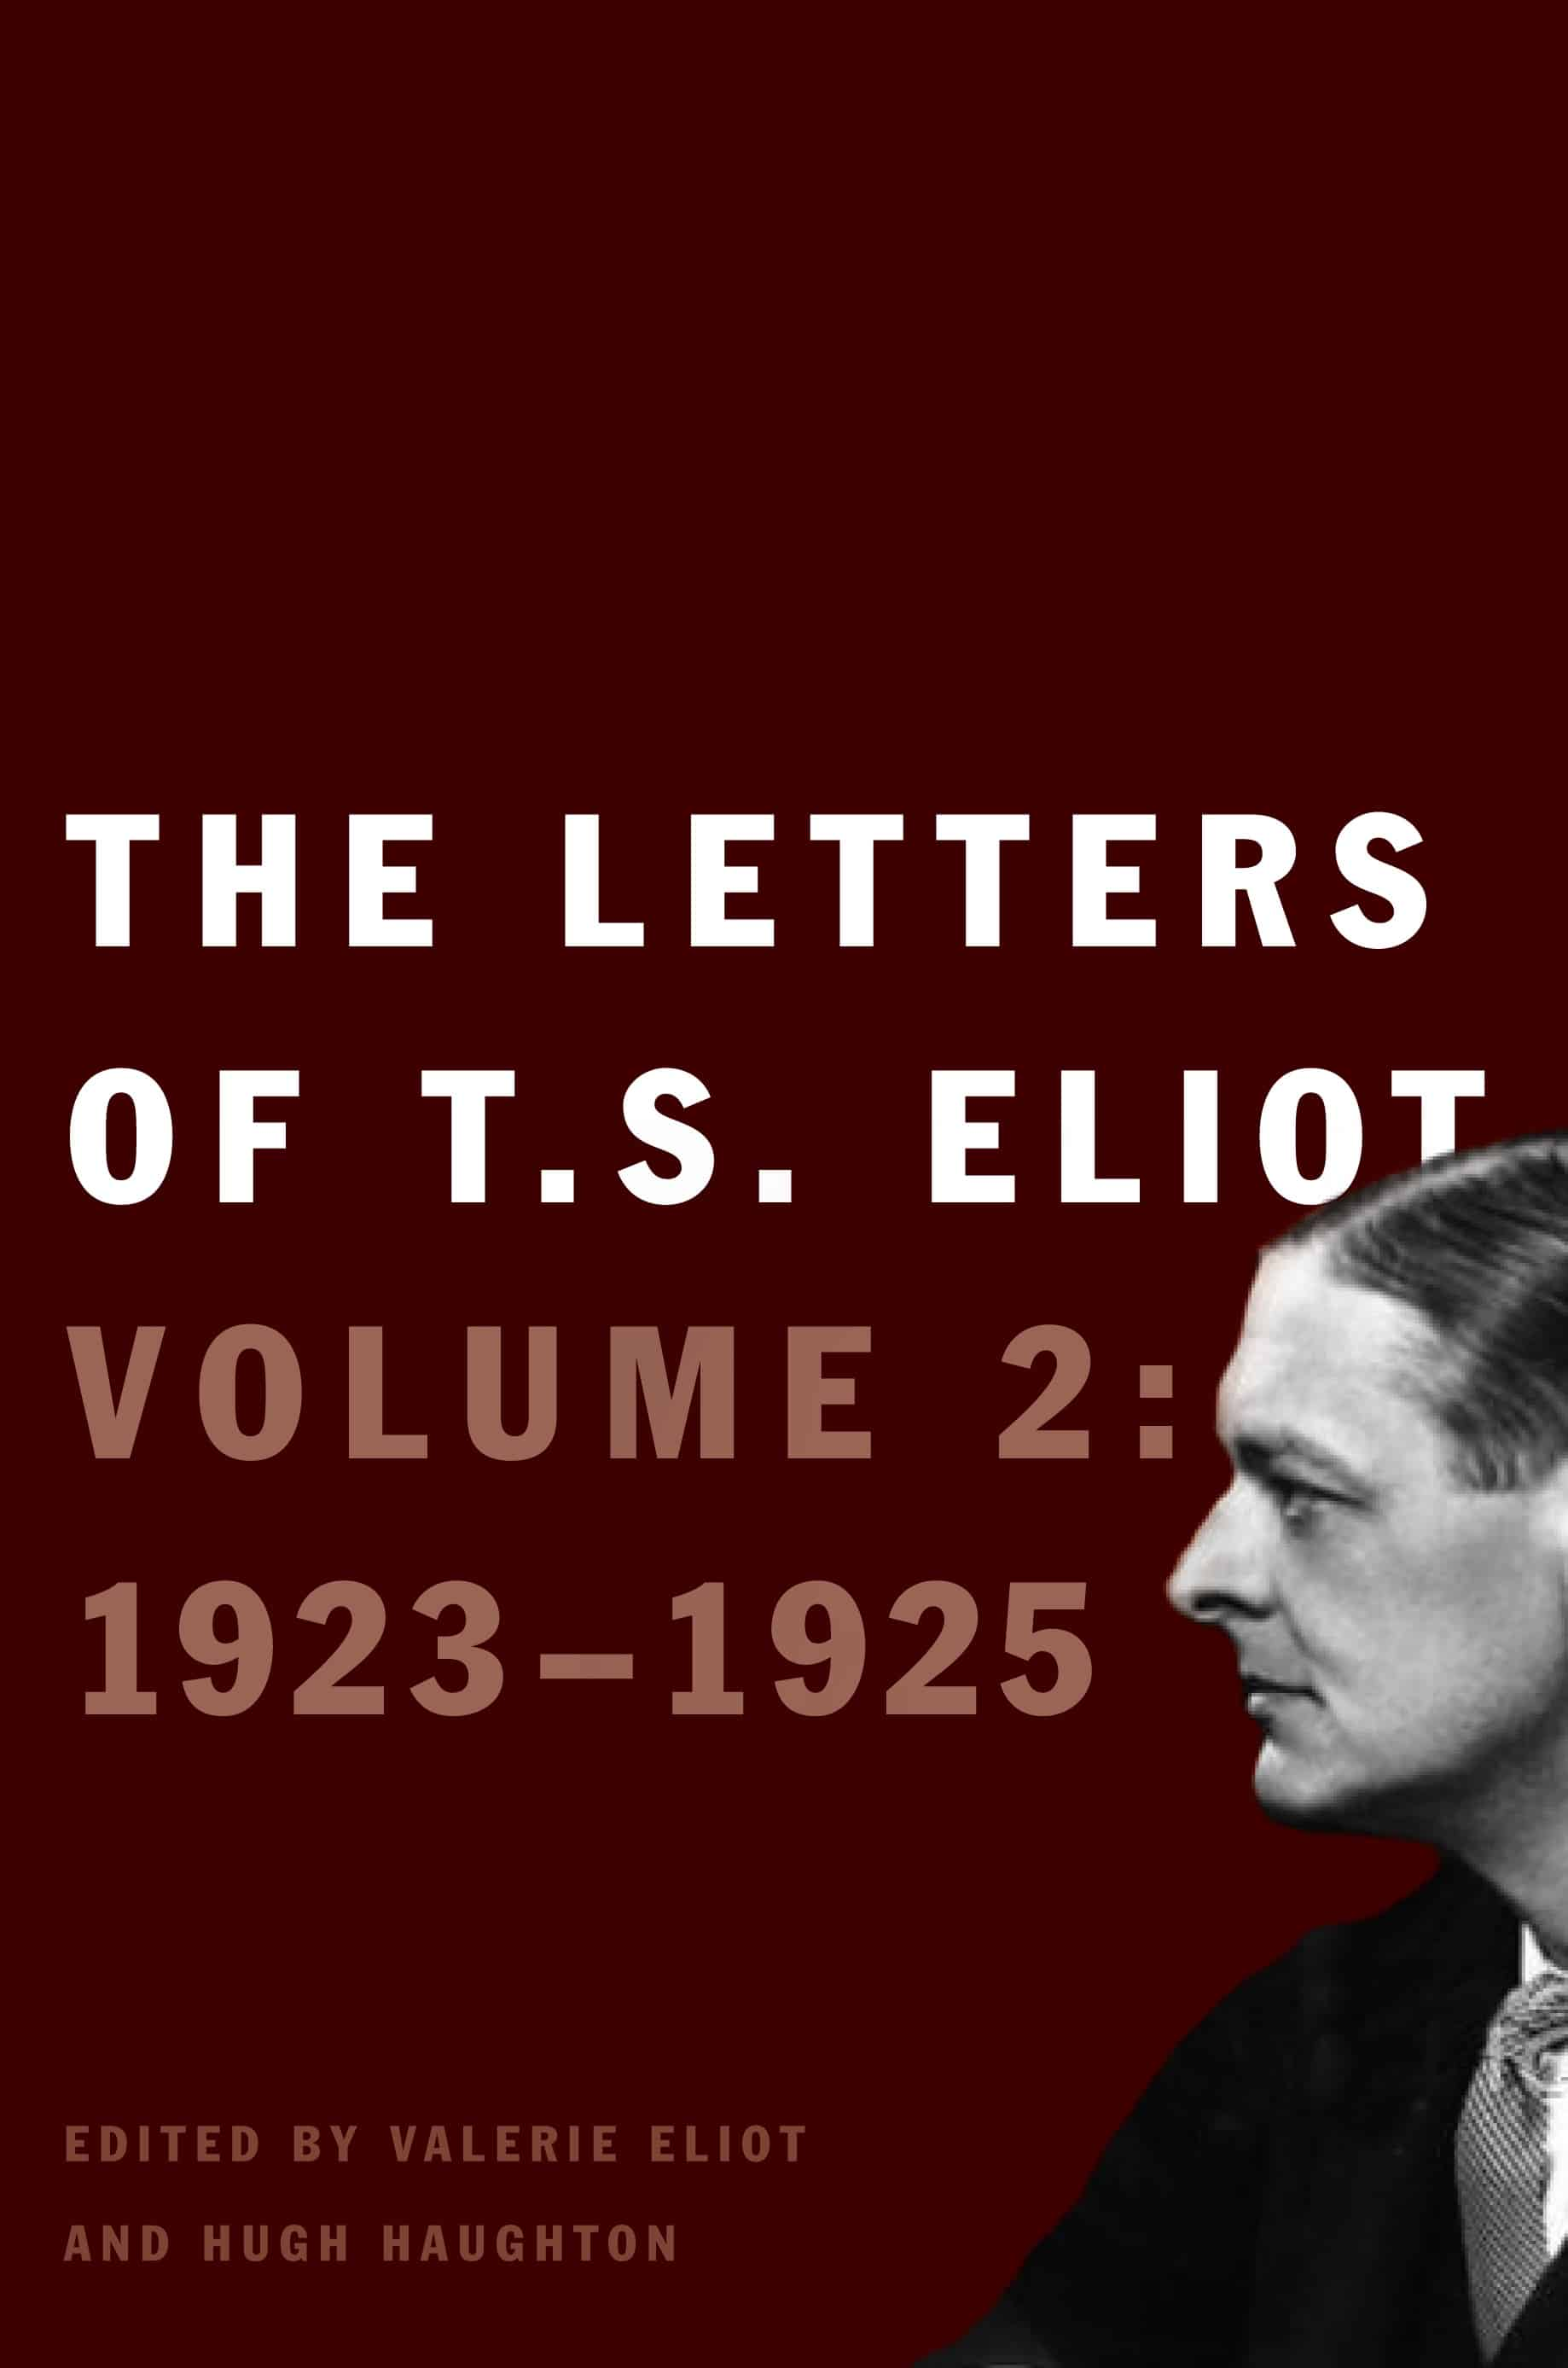 Eliot vol 2 jacket - The Letters of T. S. Eliot Volume 2: 1923-1925